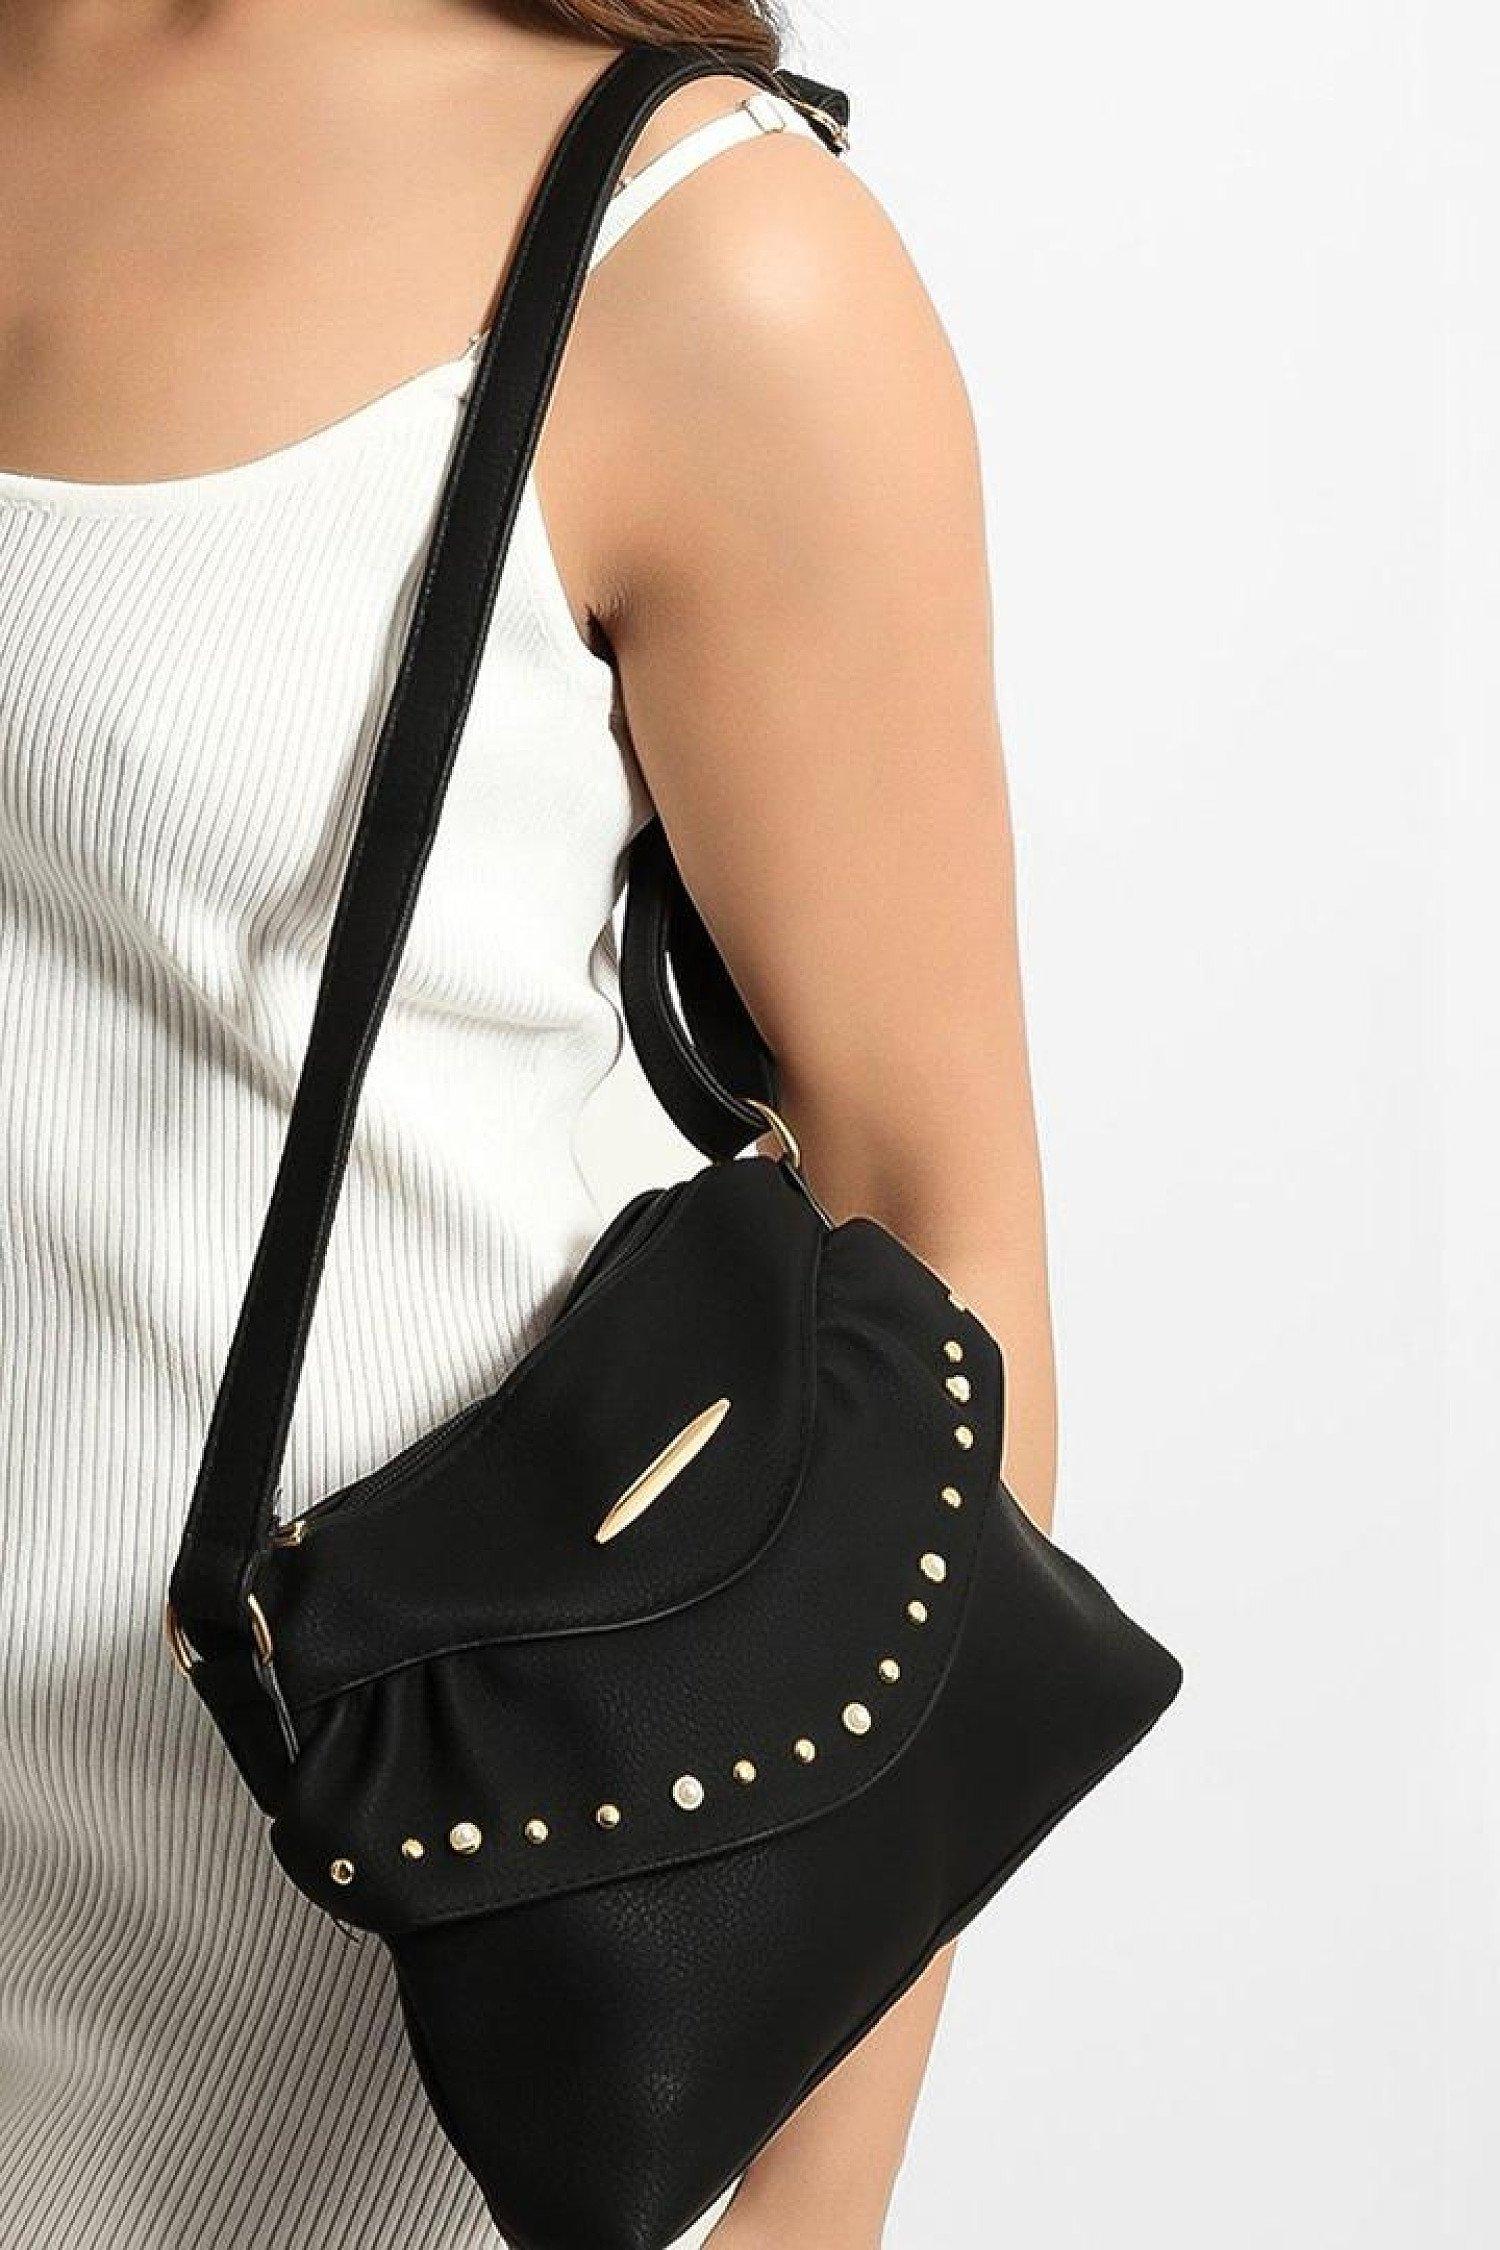 Black Embellished Front Frill Detail Mini Crossbody Bag